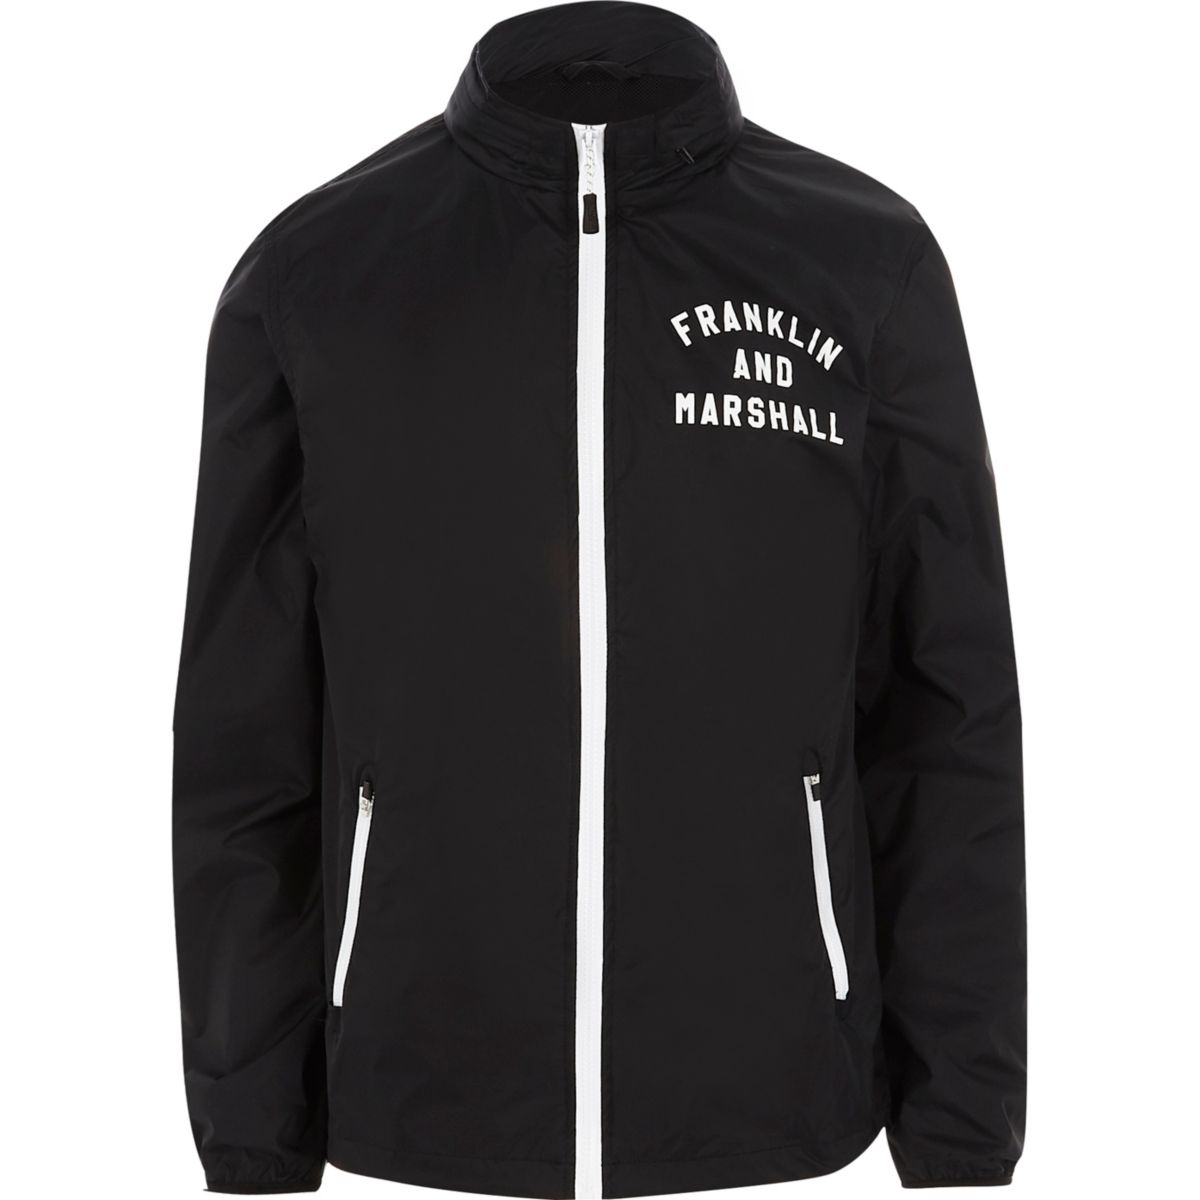 Franklin & Marshall – Marineblaue, leichte Jacke